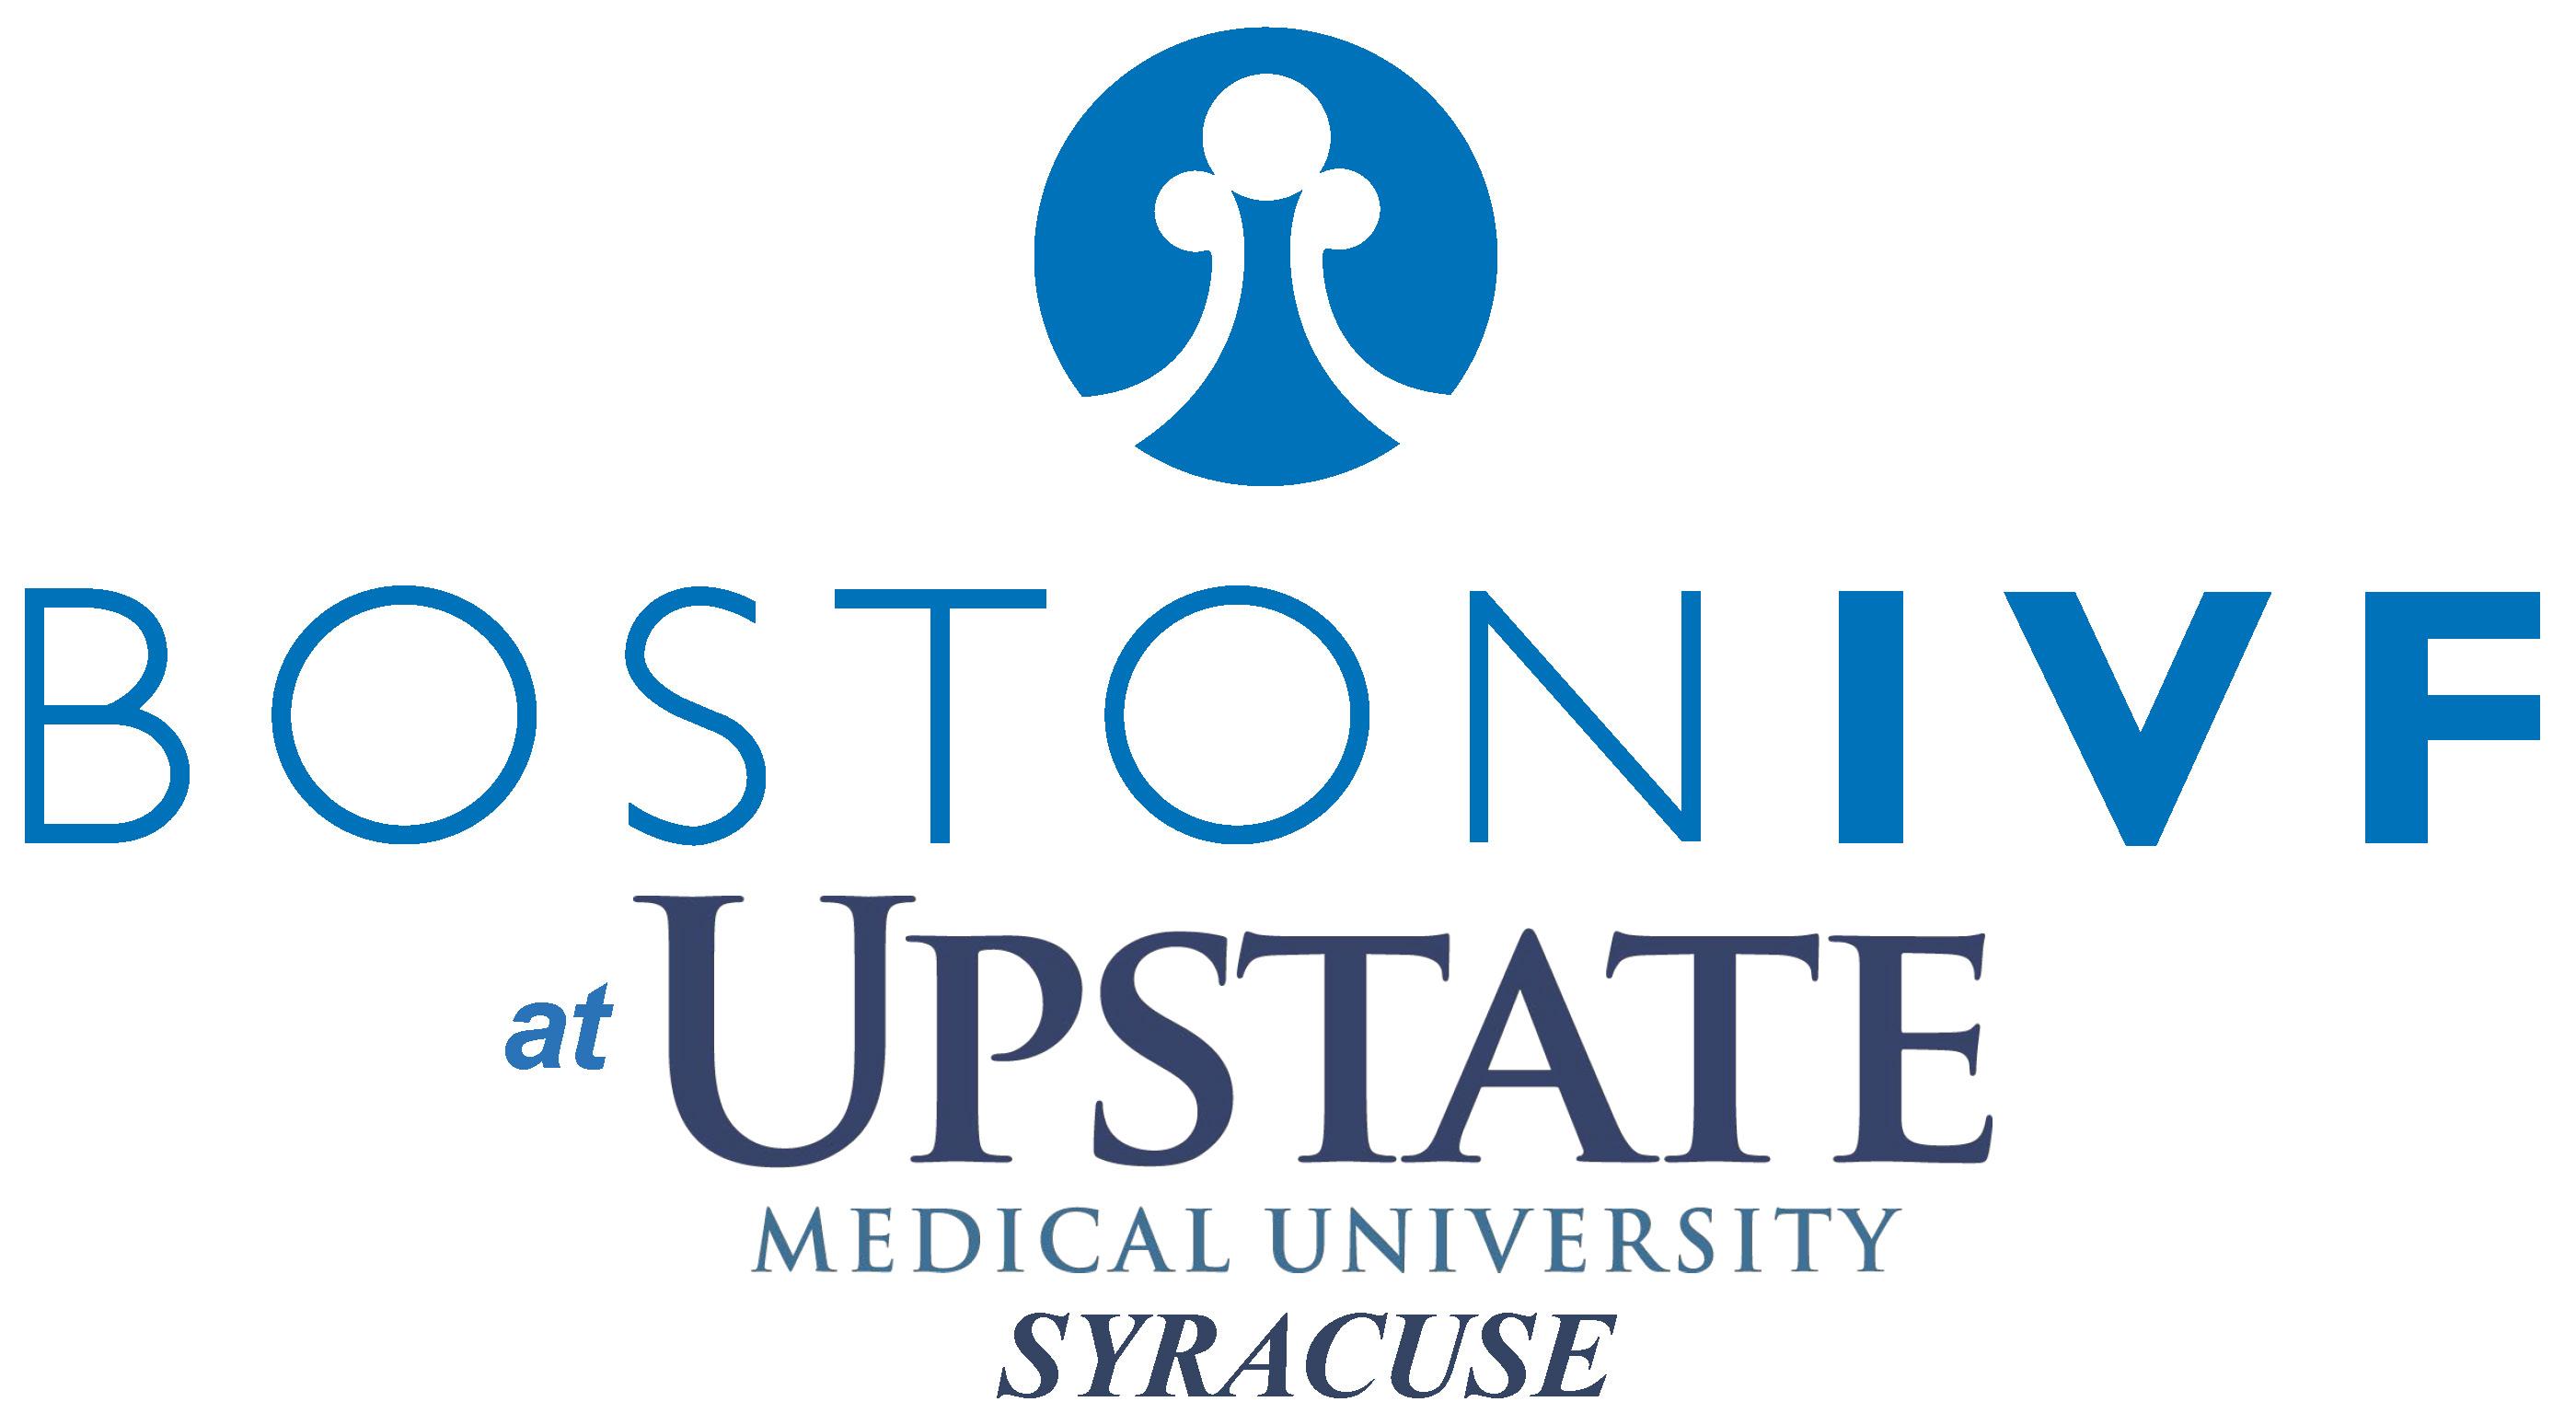 Syracuse University Academic Logo Clipart Vector Design